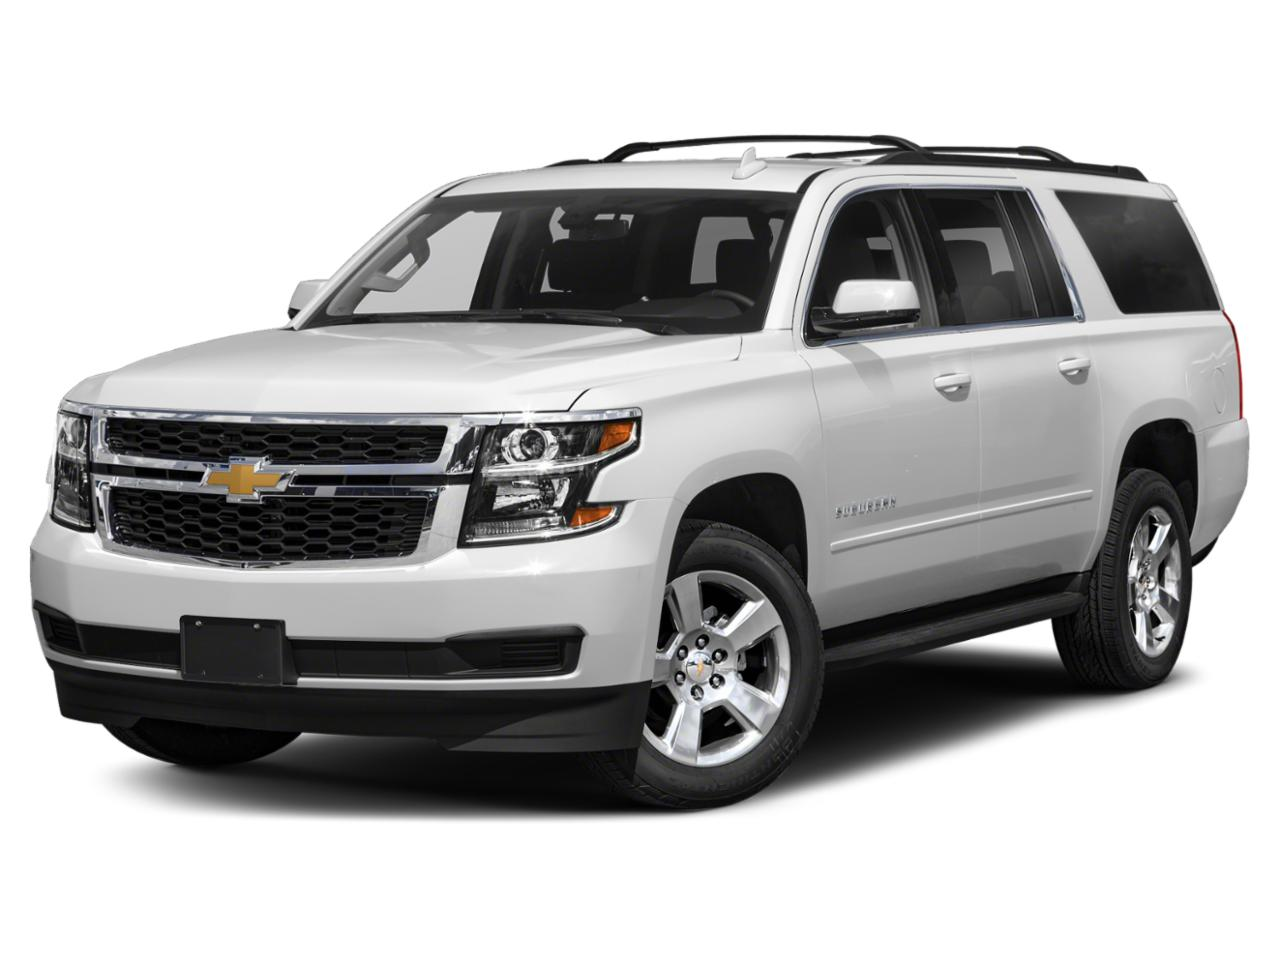 Summit White 2020 Chevrolet Suburban LT SUV Lexington NC